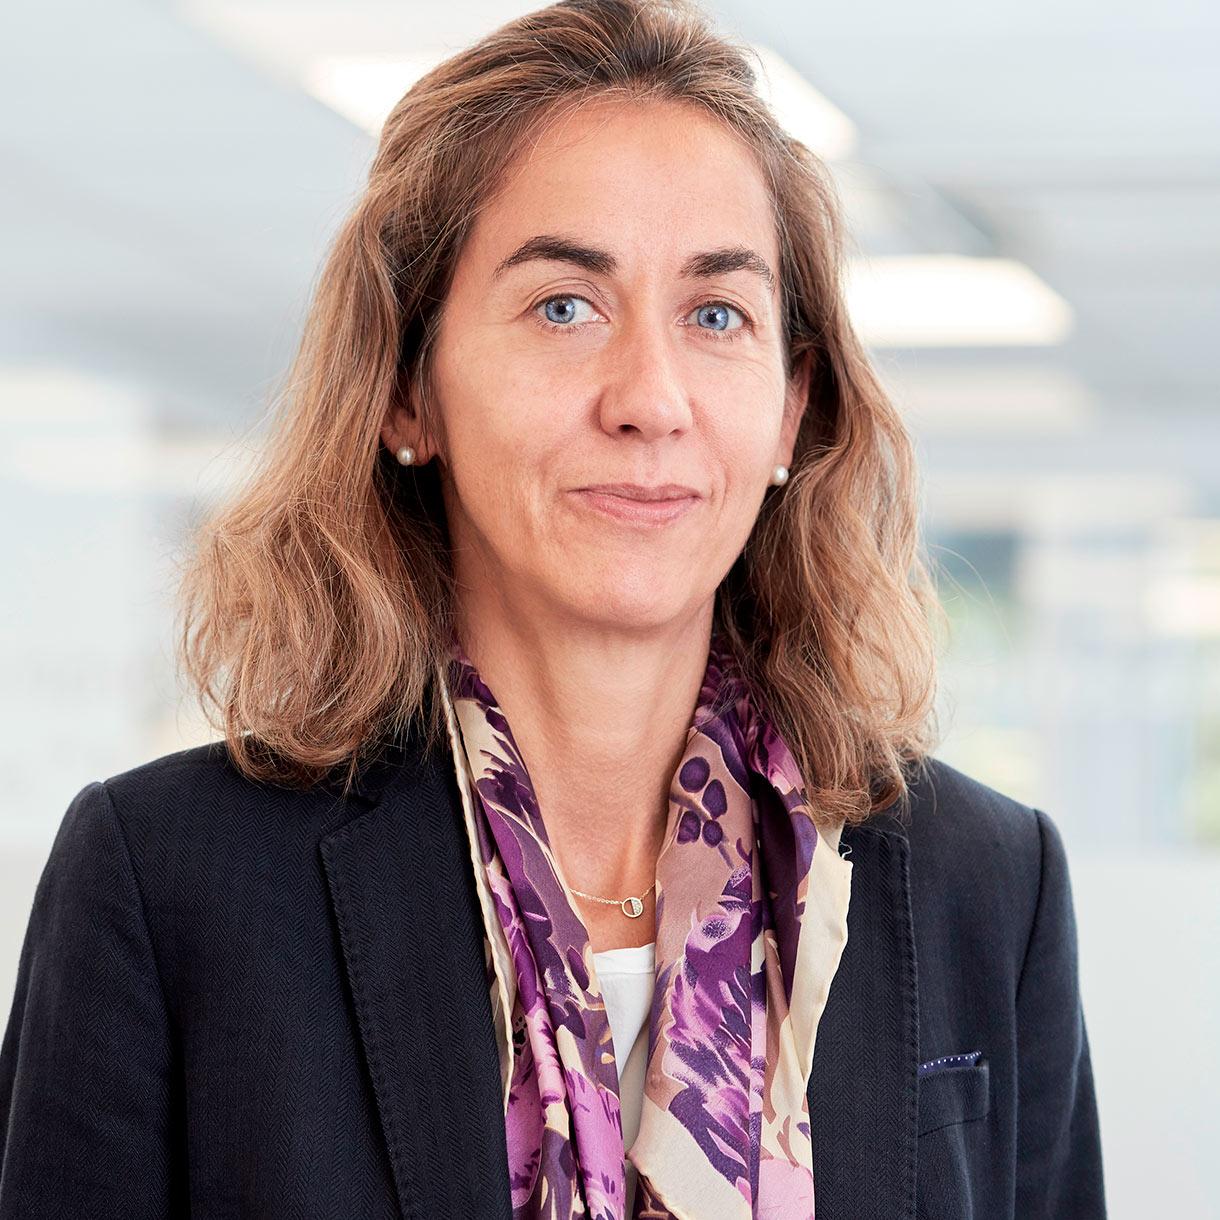 María Horcajo LLorente